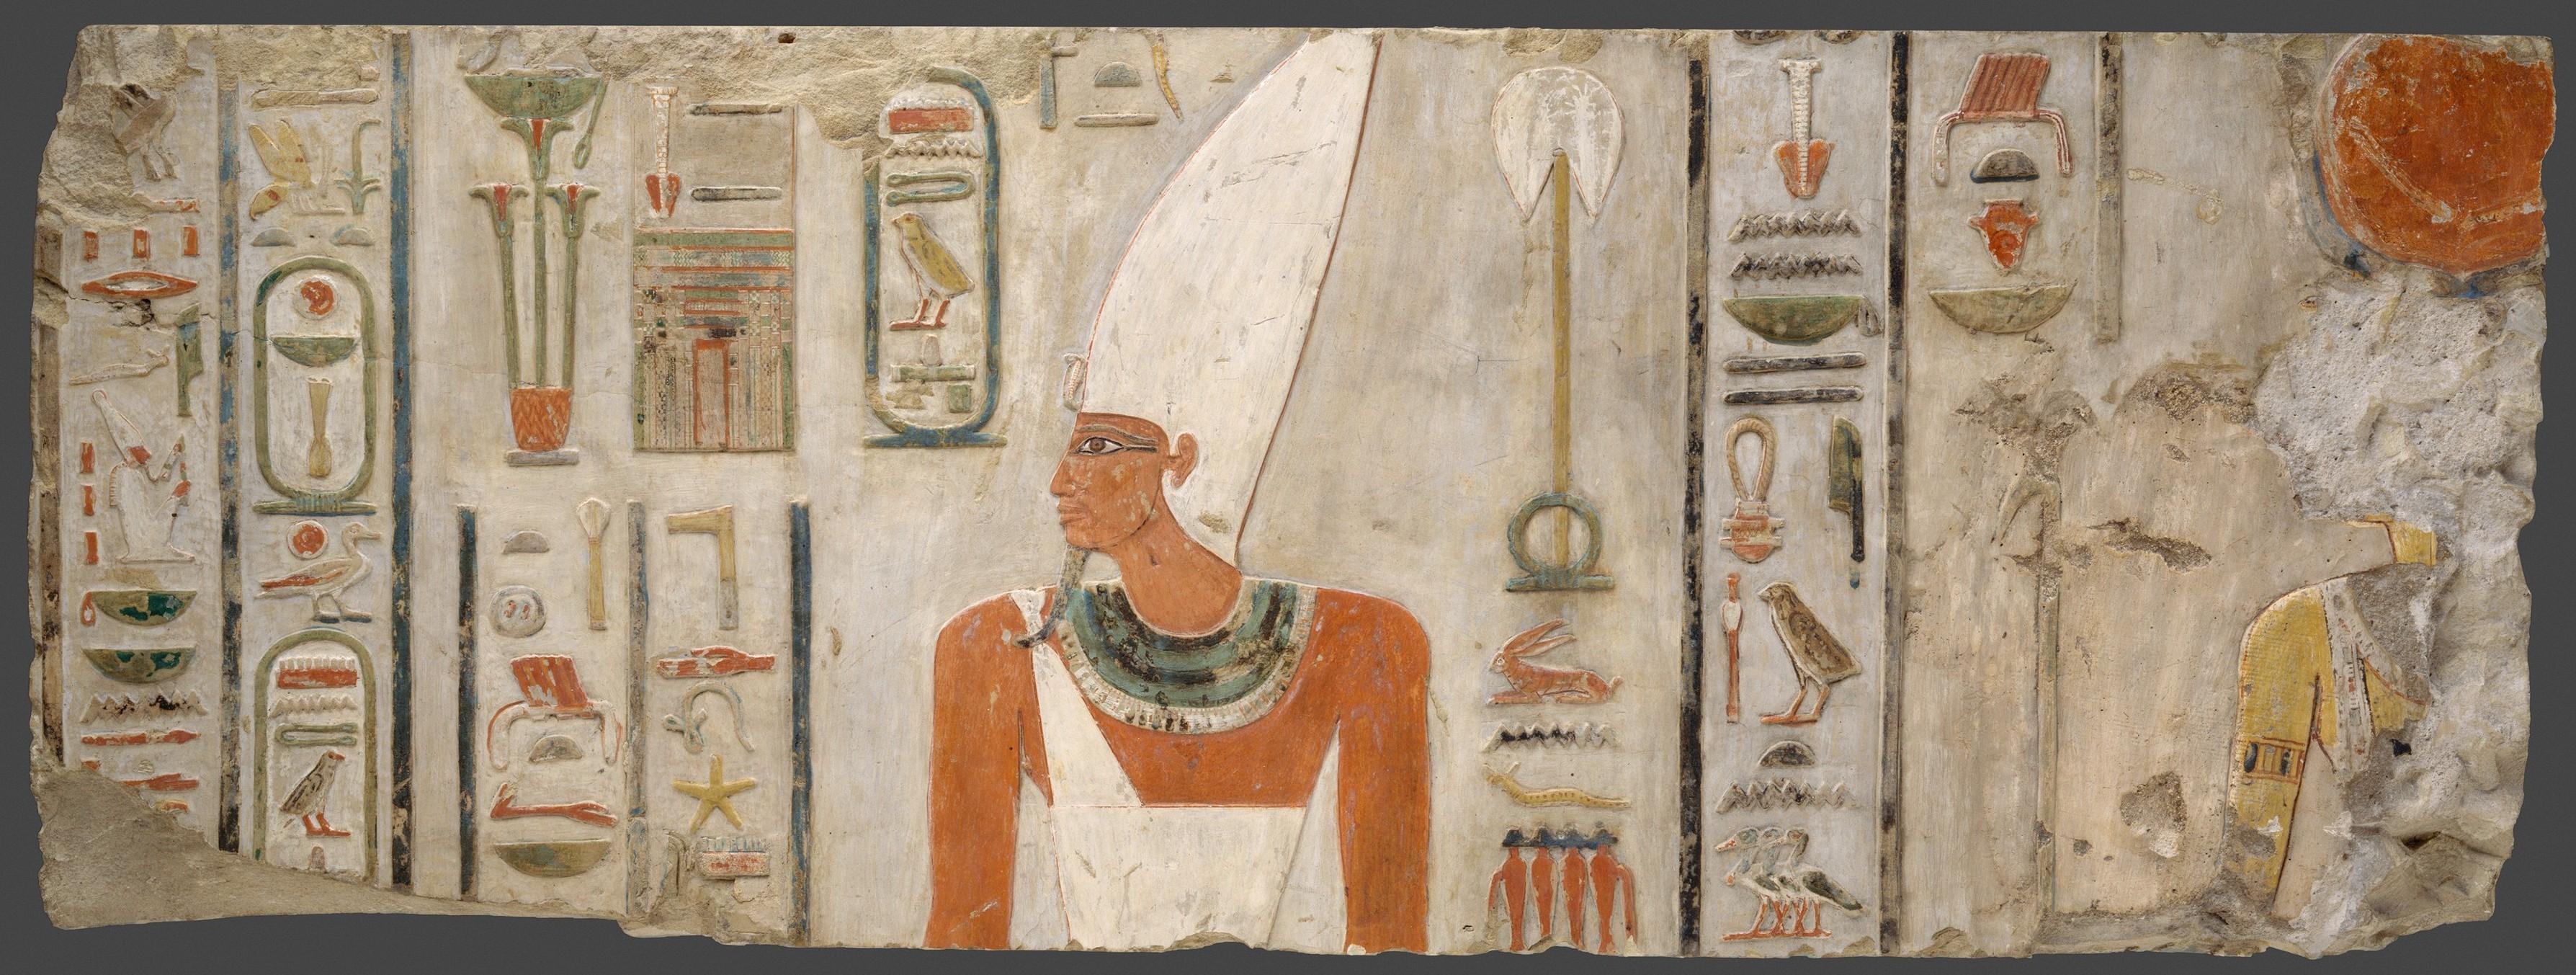 Archivo:MentuhotepII.jpg